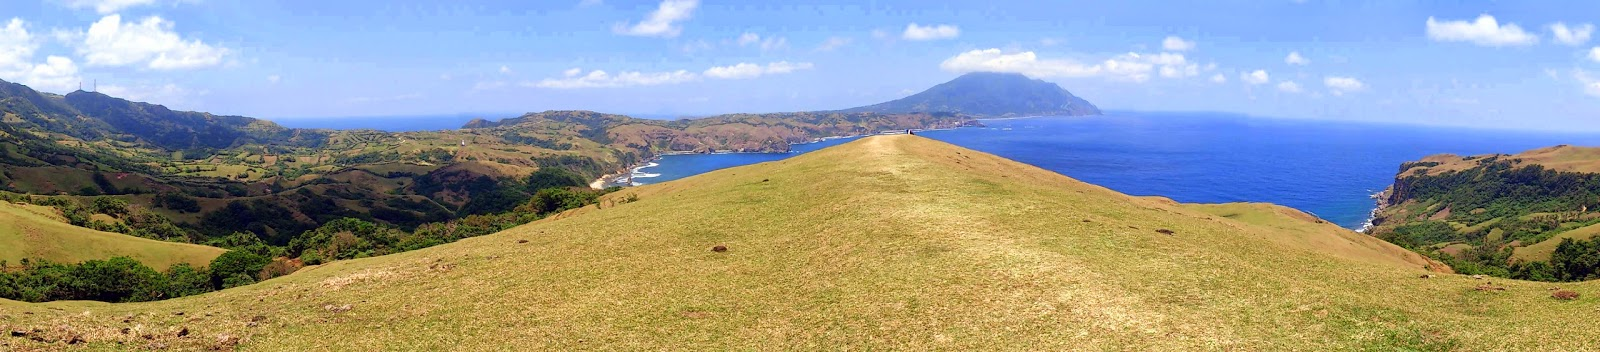 Rakuh a Payaman (Marlboro Hills), South Batan, Batanes